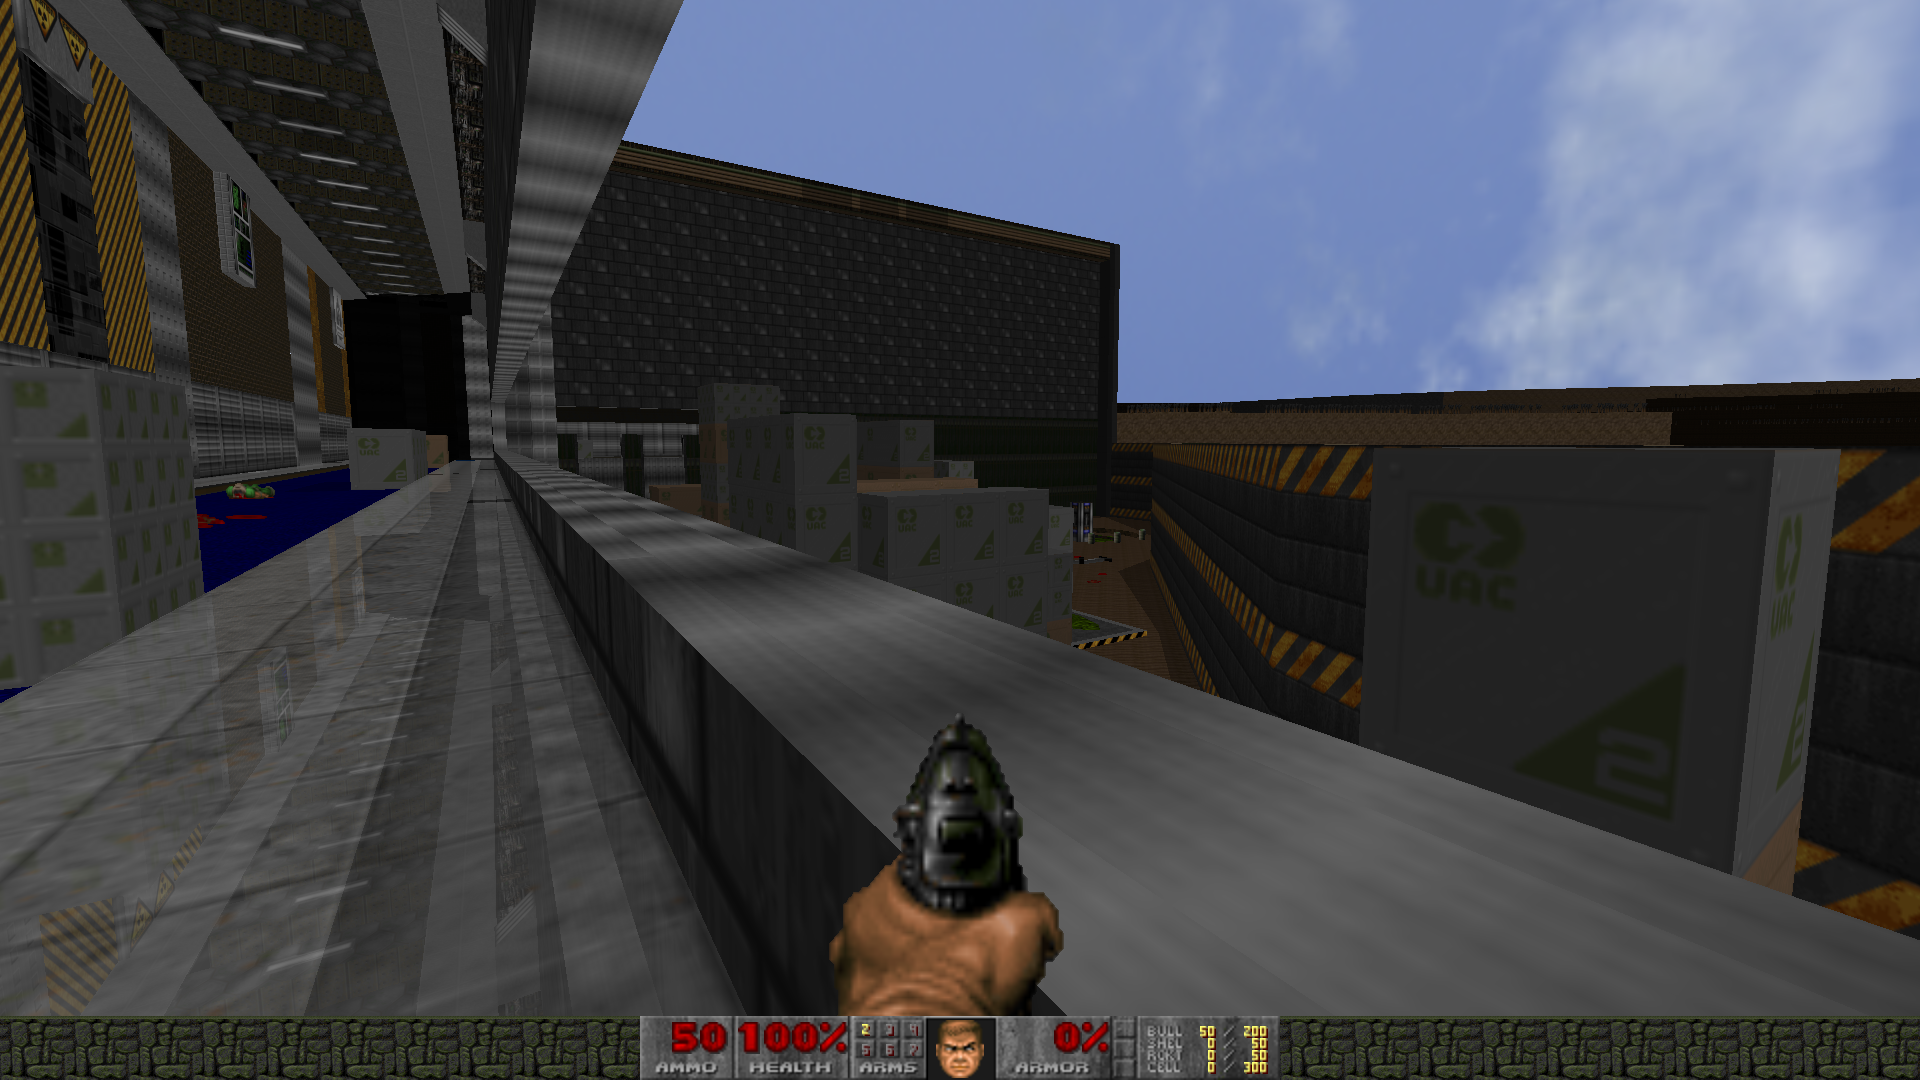 Screenshot_Doom_20190516_132057.png.76df71328d3cce6b7b668be342d99114.png